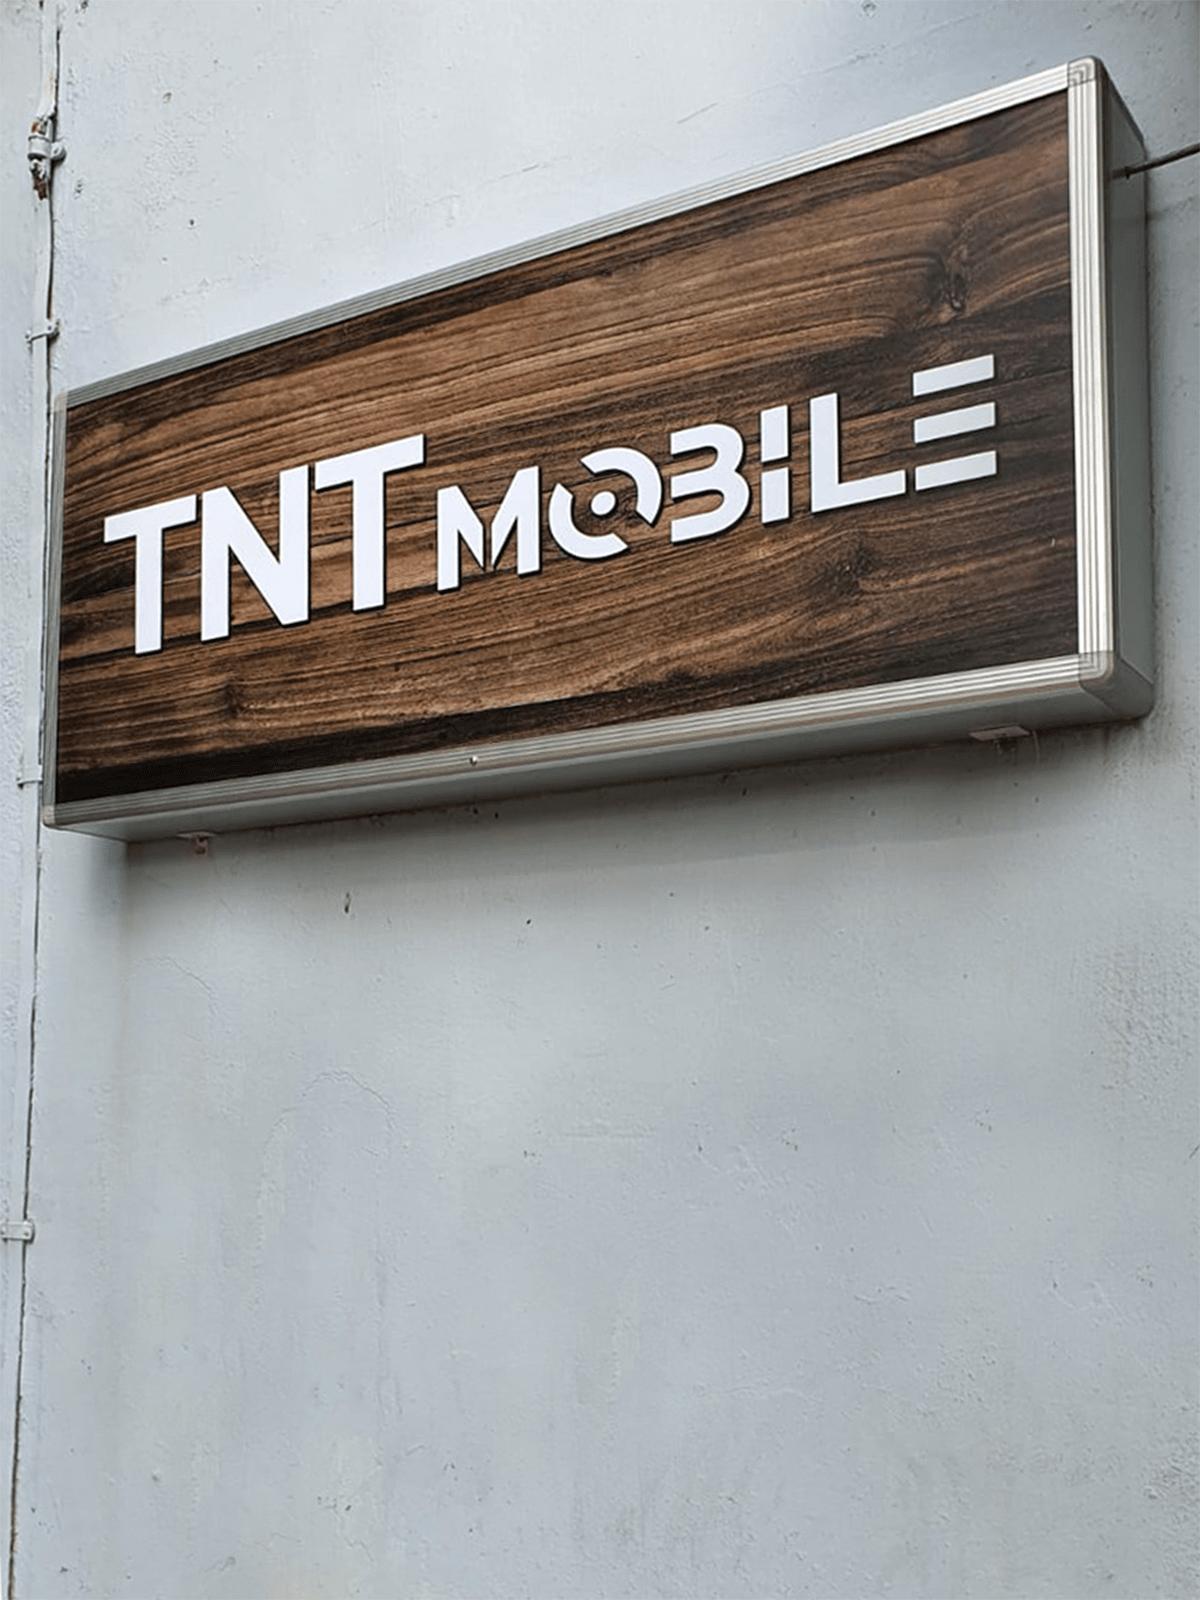 tnt mobile